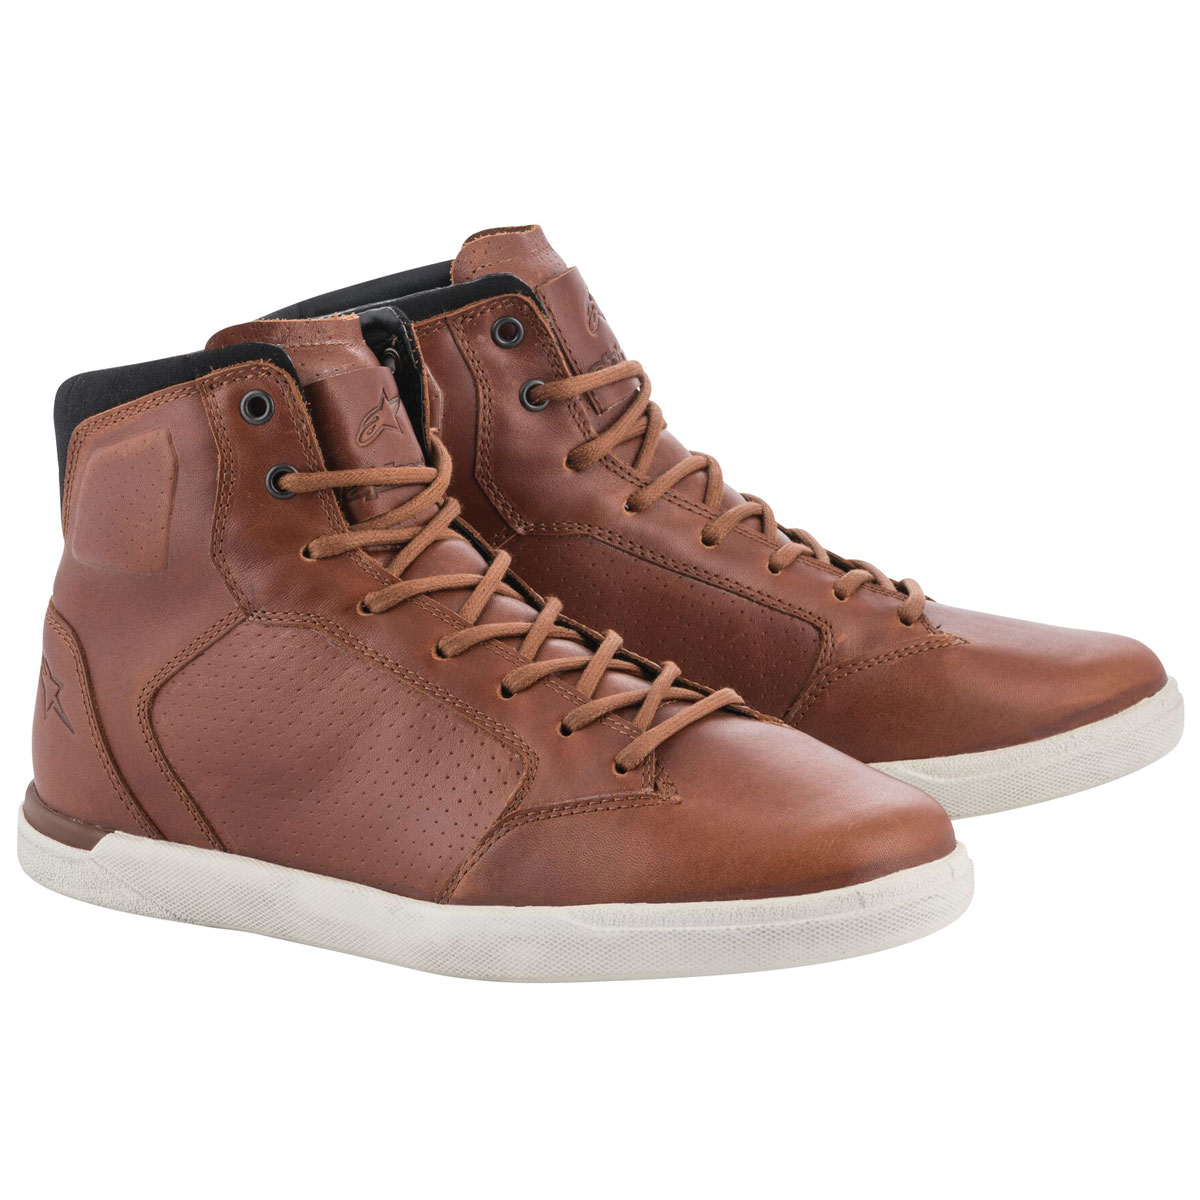 Alpinestars Men's J-Cult Brown Leather Shoes